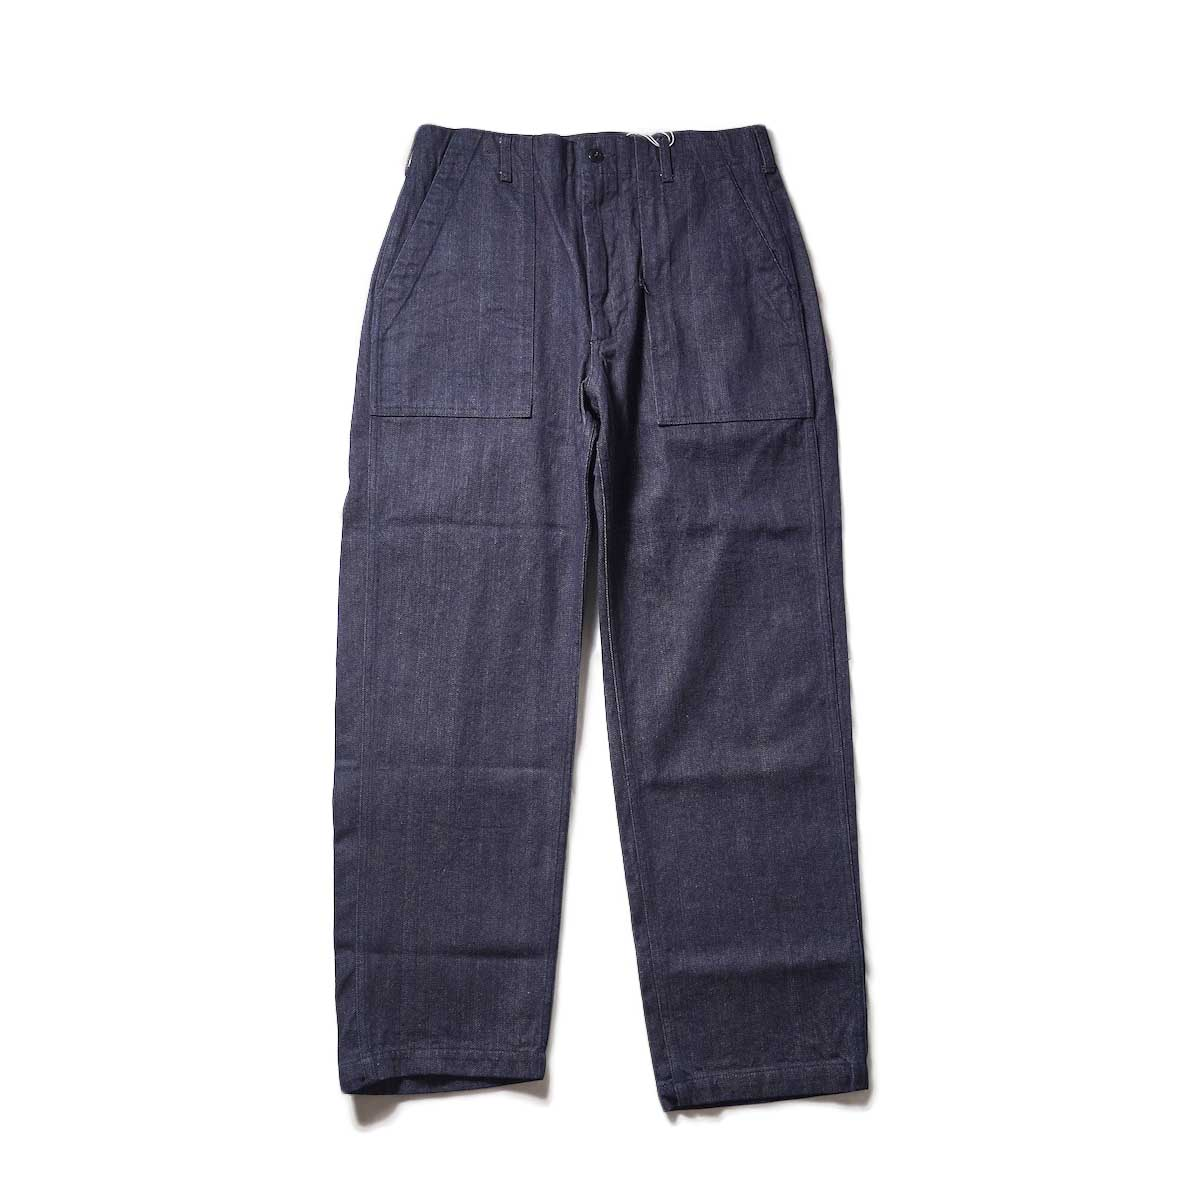 ENGINEERED GARMENTS / FATIGUE PANTS - INDIGO 10oz BROKEN DENIM (Indigo)